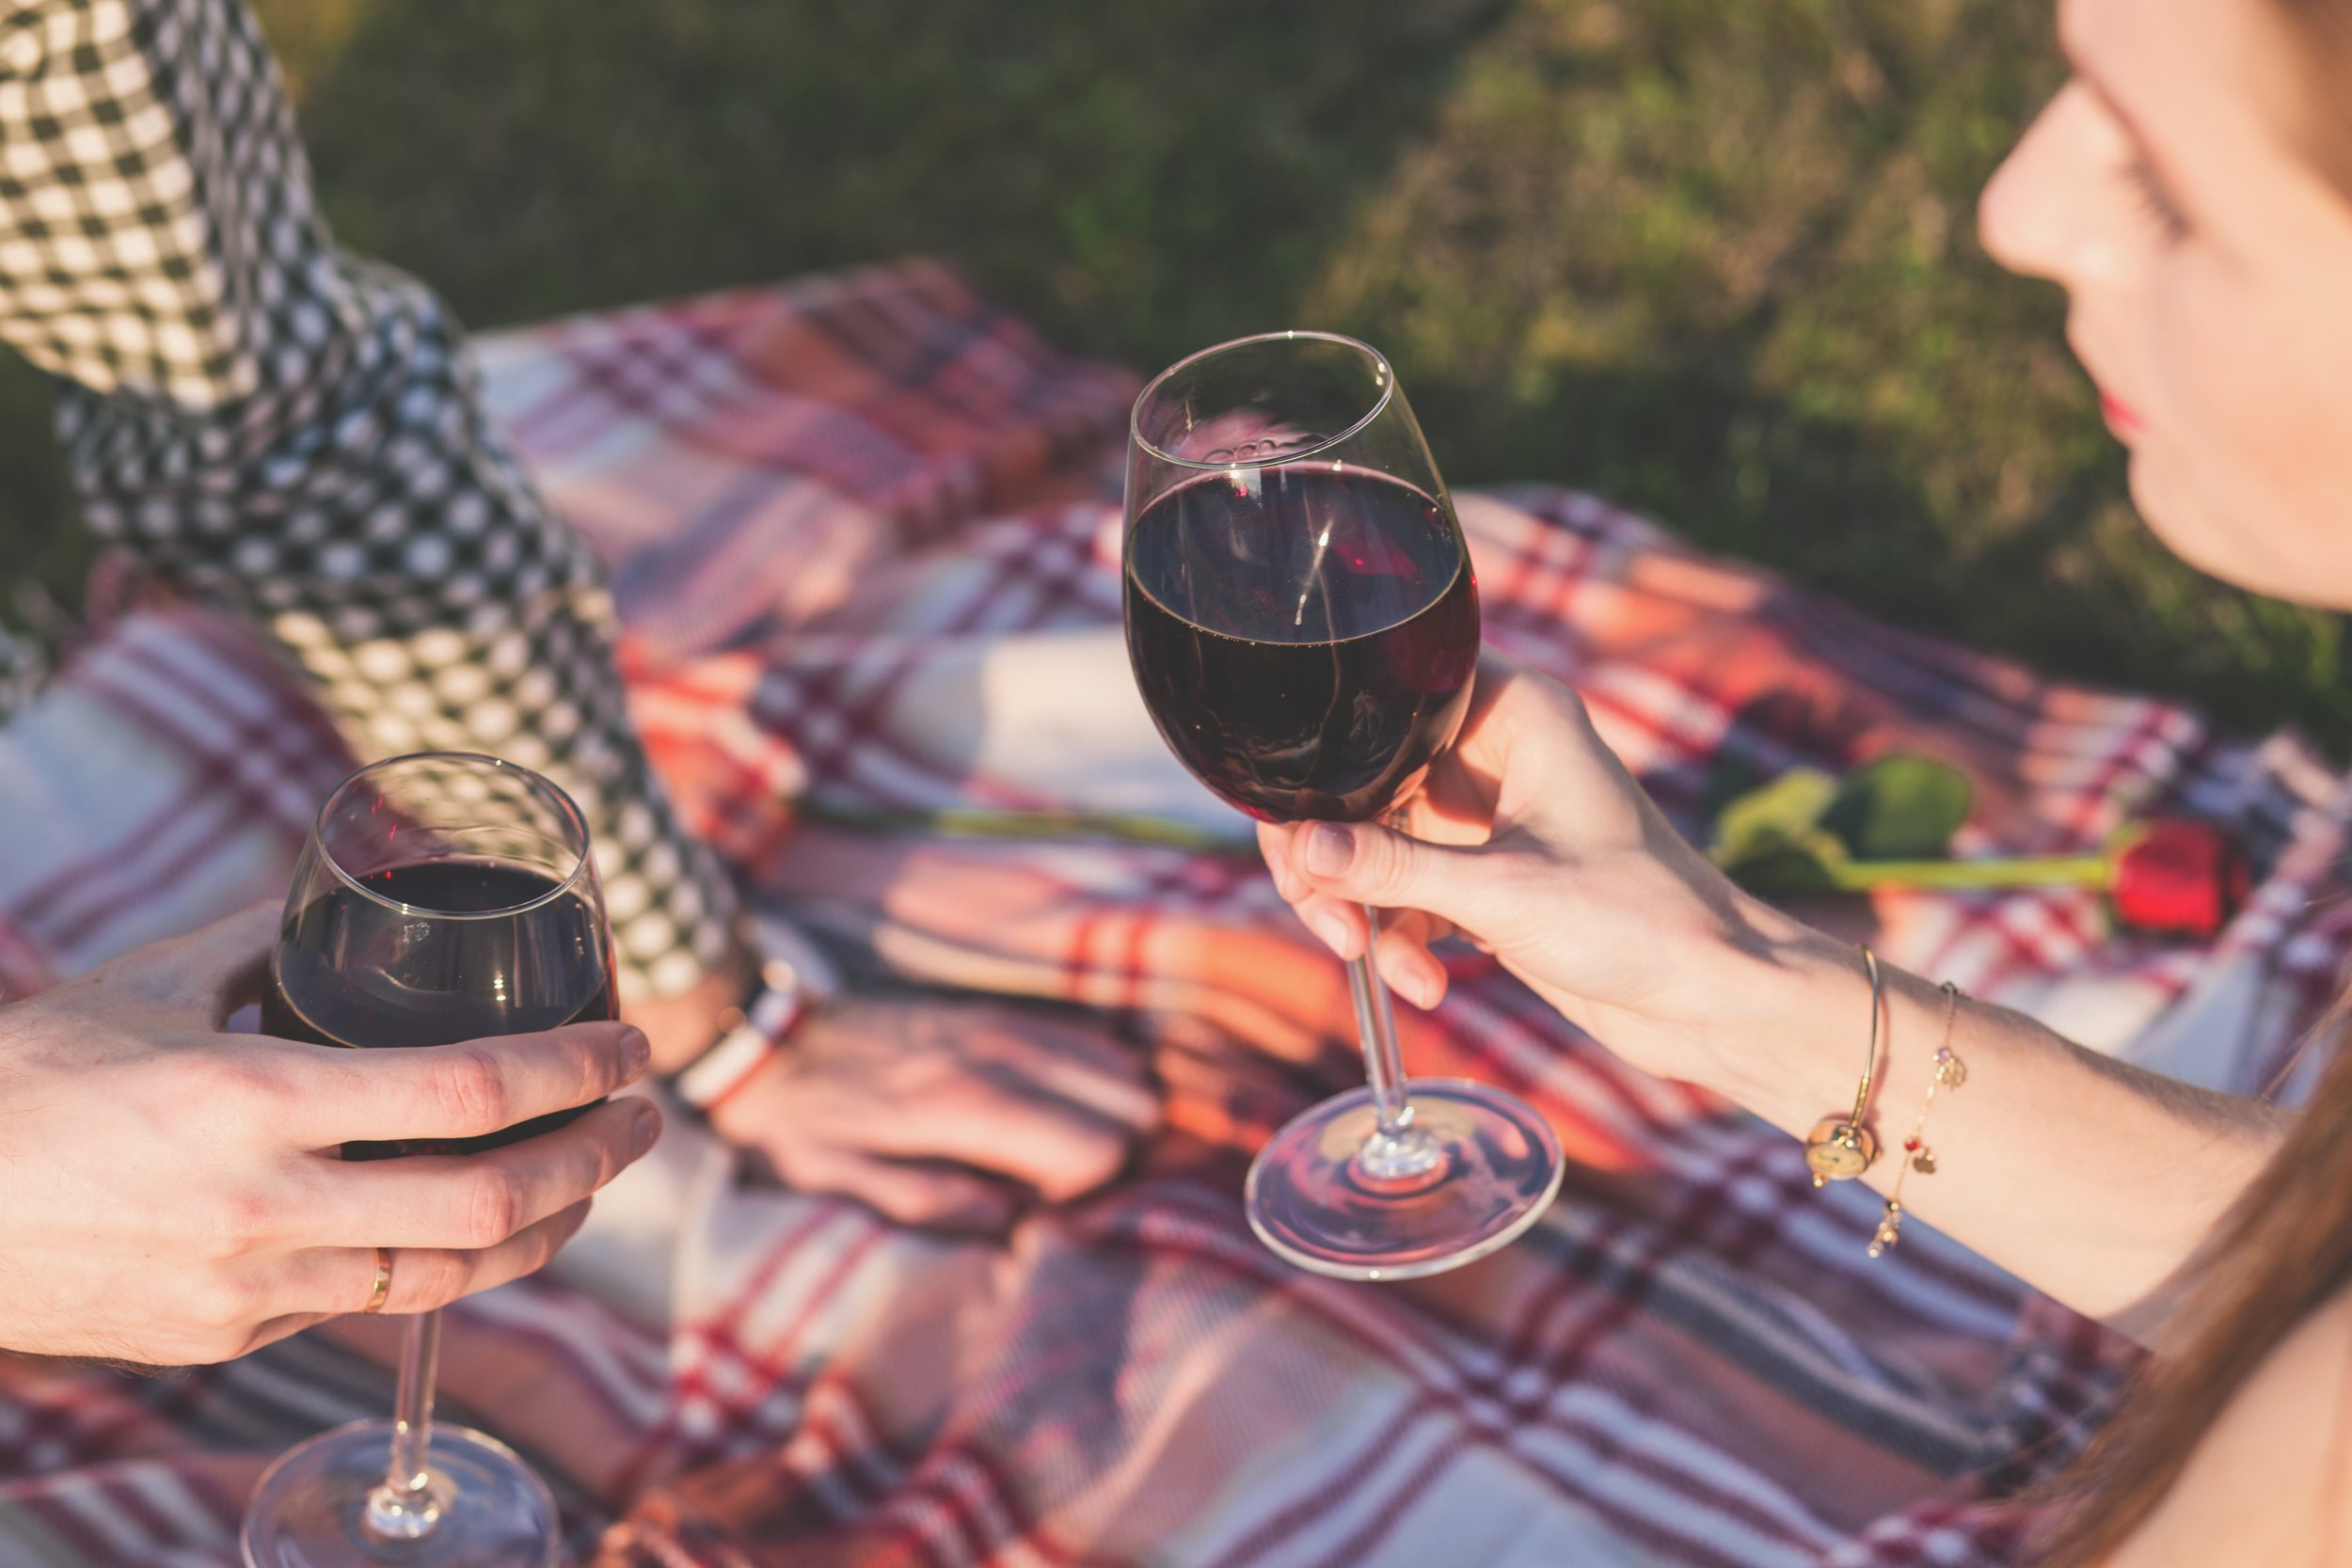 alcohol-blanket-celebration-160322.jpg